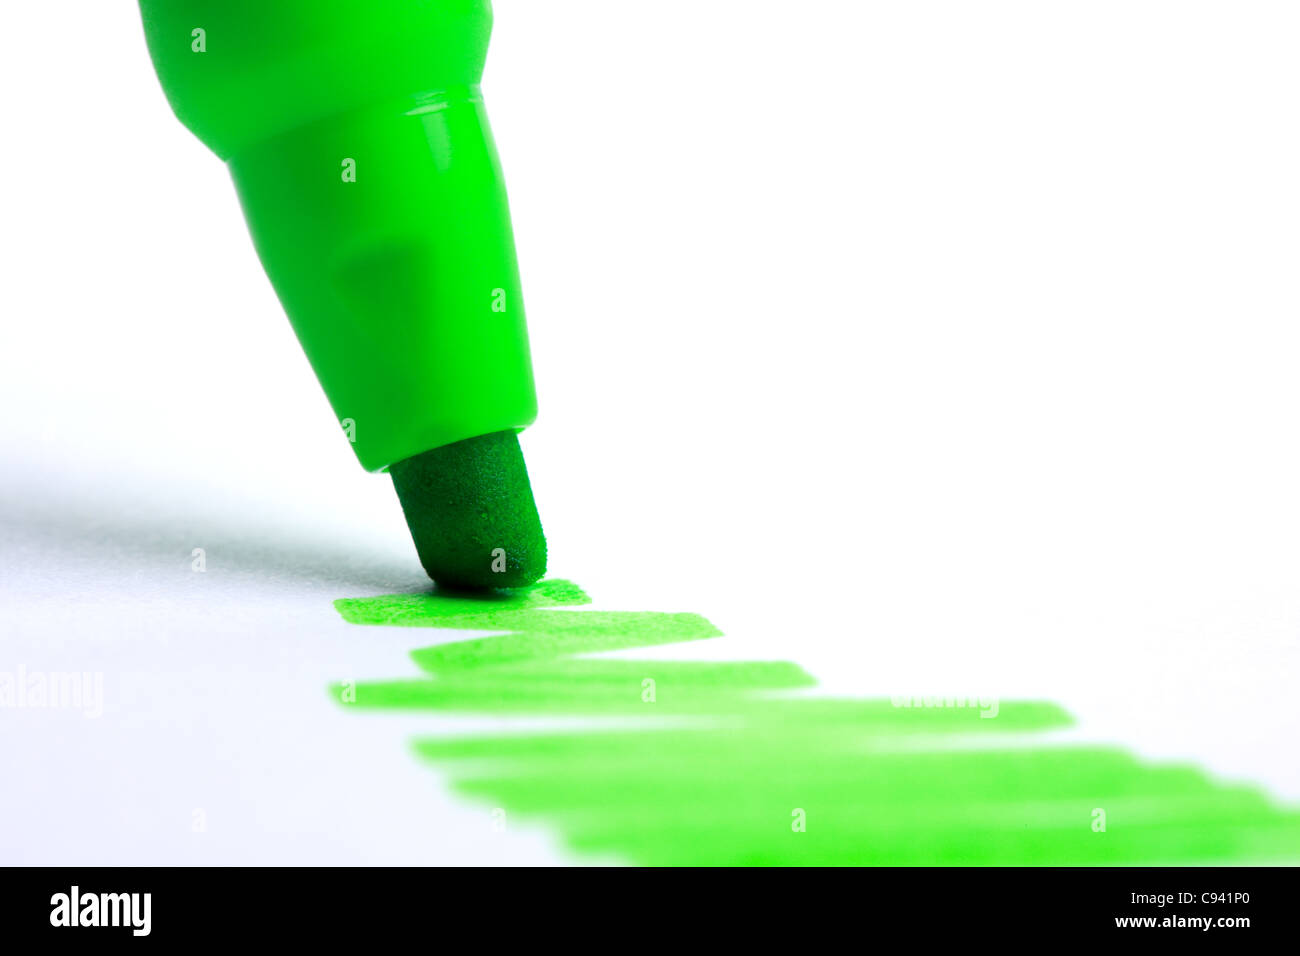 Green highlighter - Stock Image